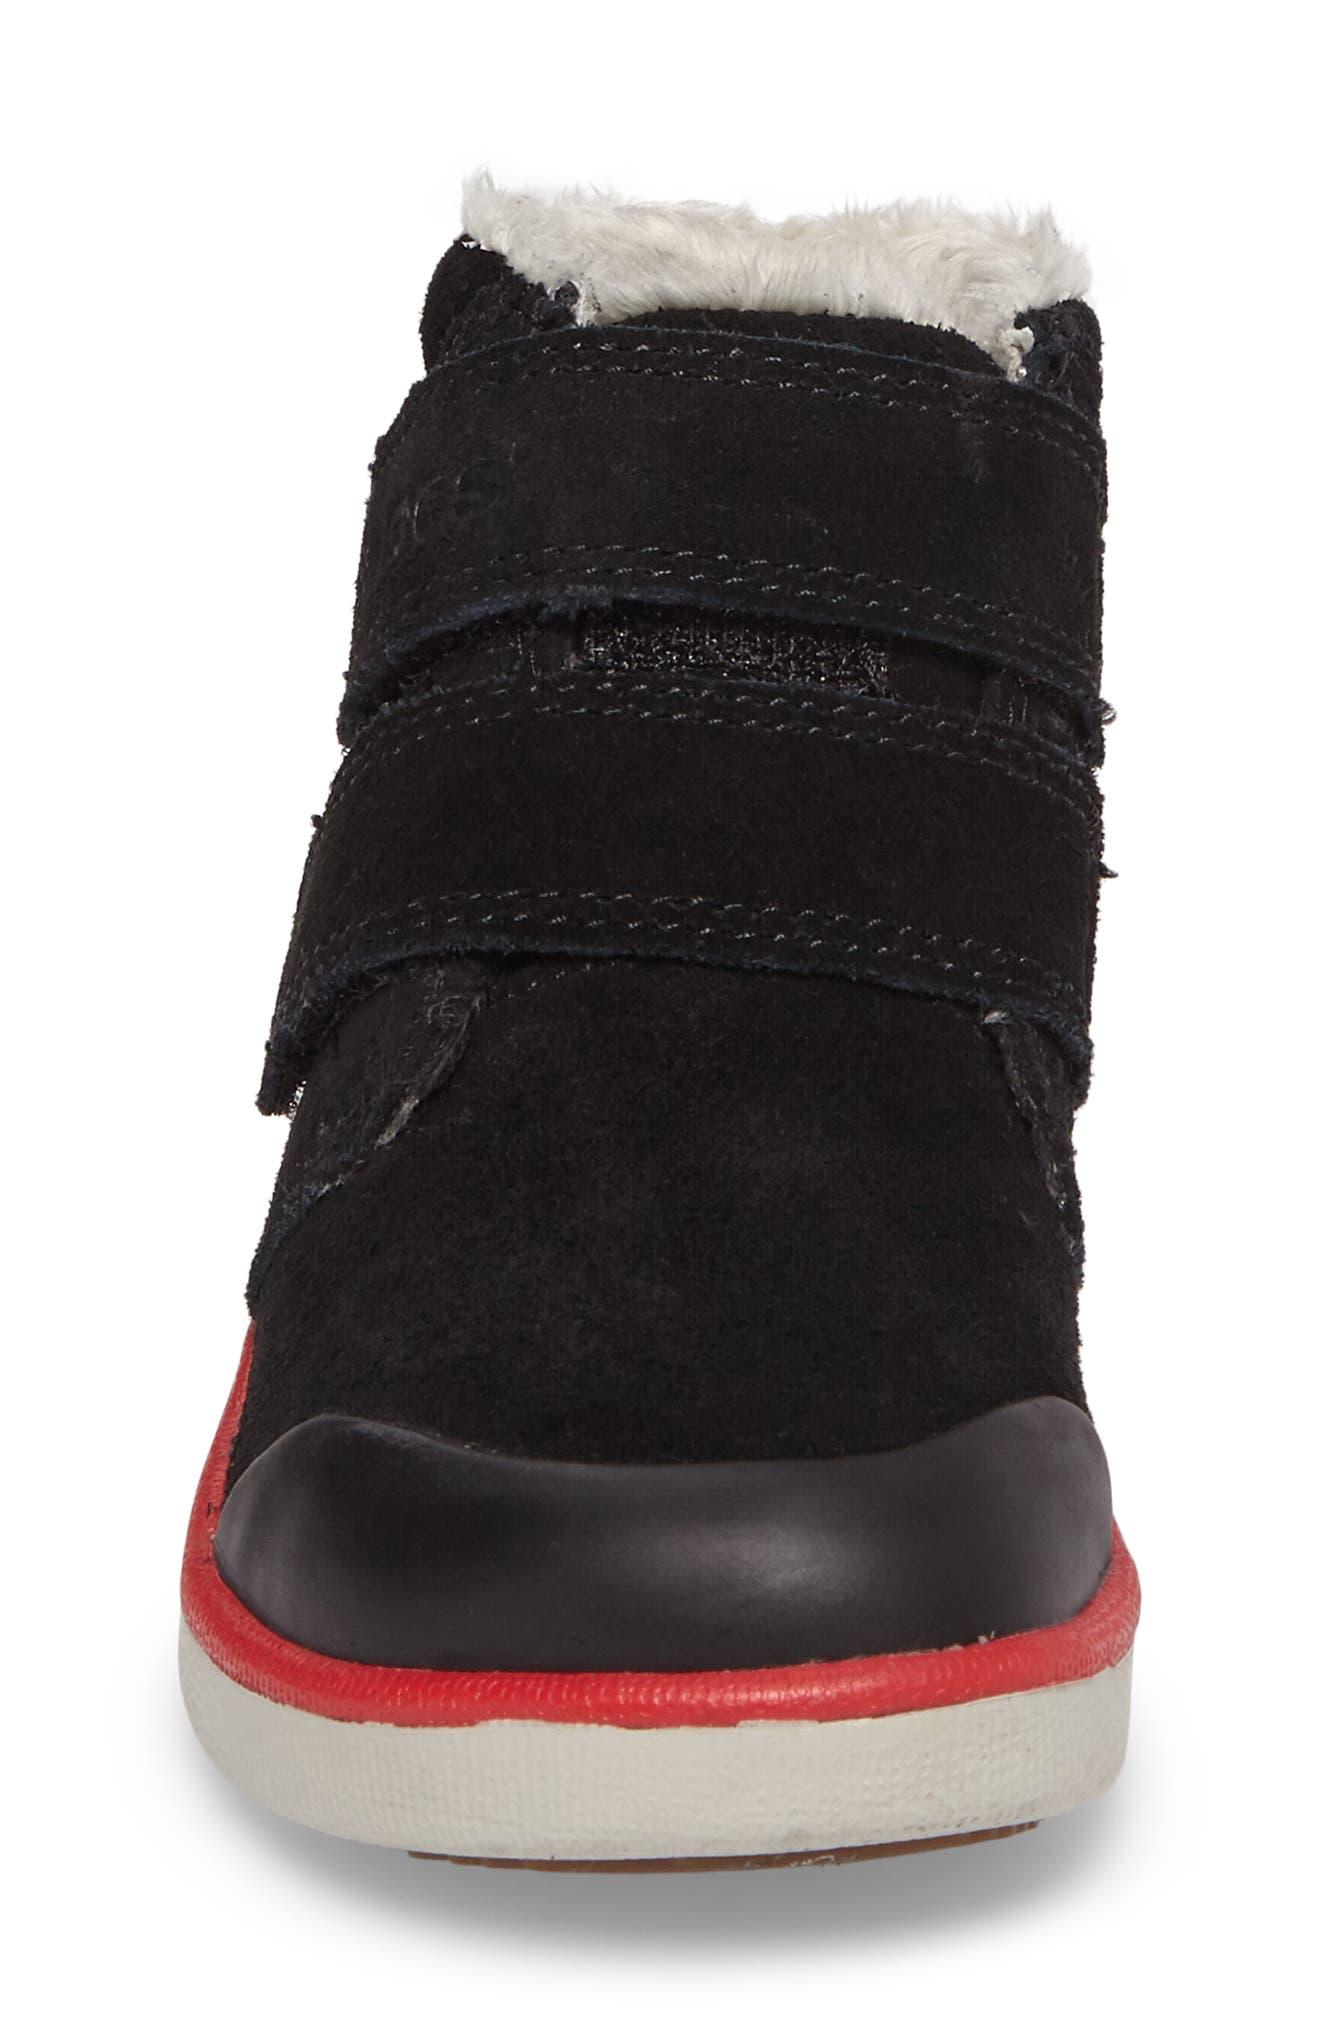 Samantha Faux Fur Waterproof Boot,                             Alternate thumbnail 4, color,                             Black/ Black